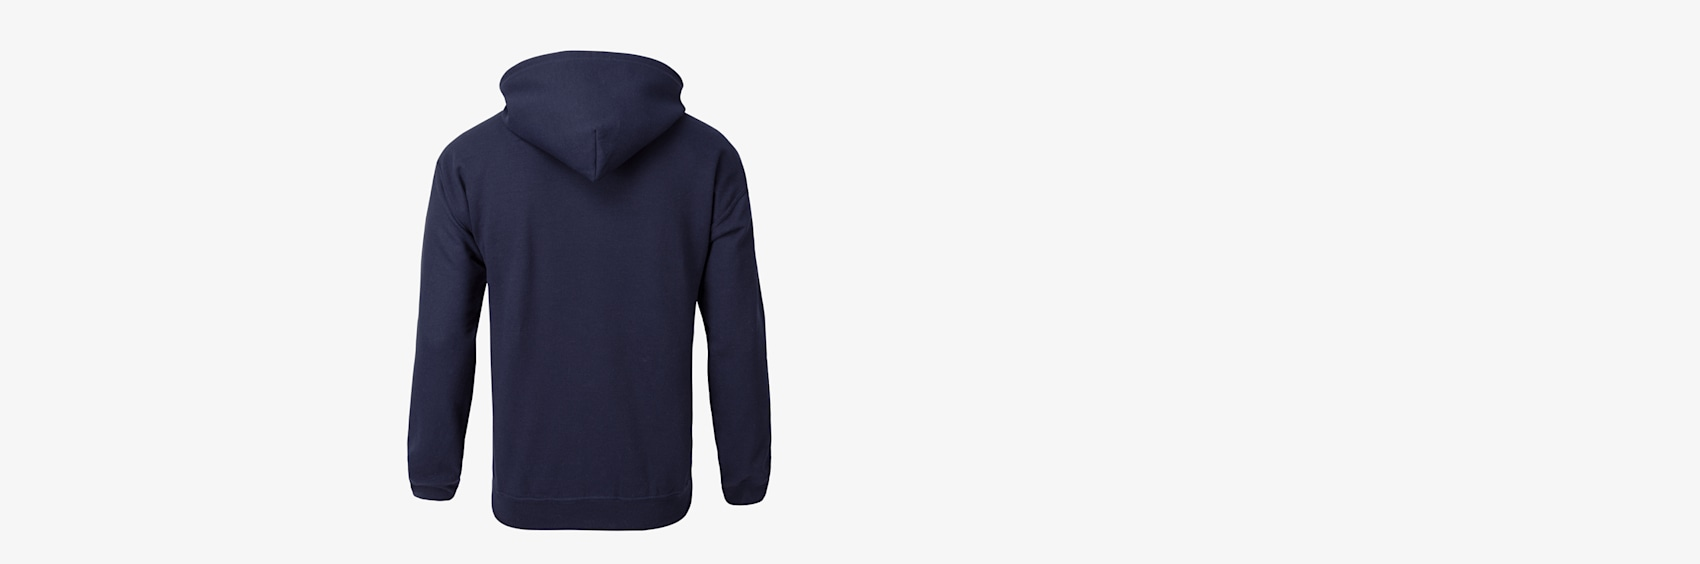 Custom embroidered sweatshirts